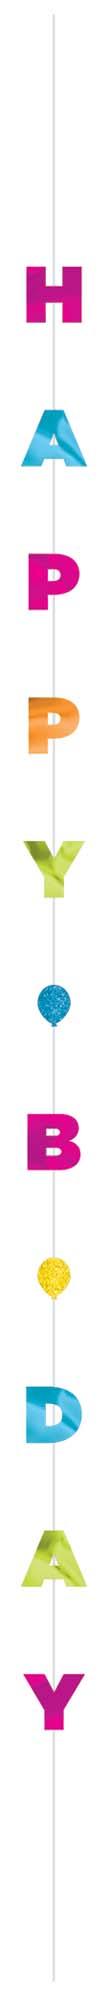 Balloon Fun Strings Happy Birthday Brights